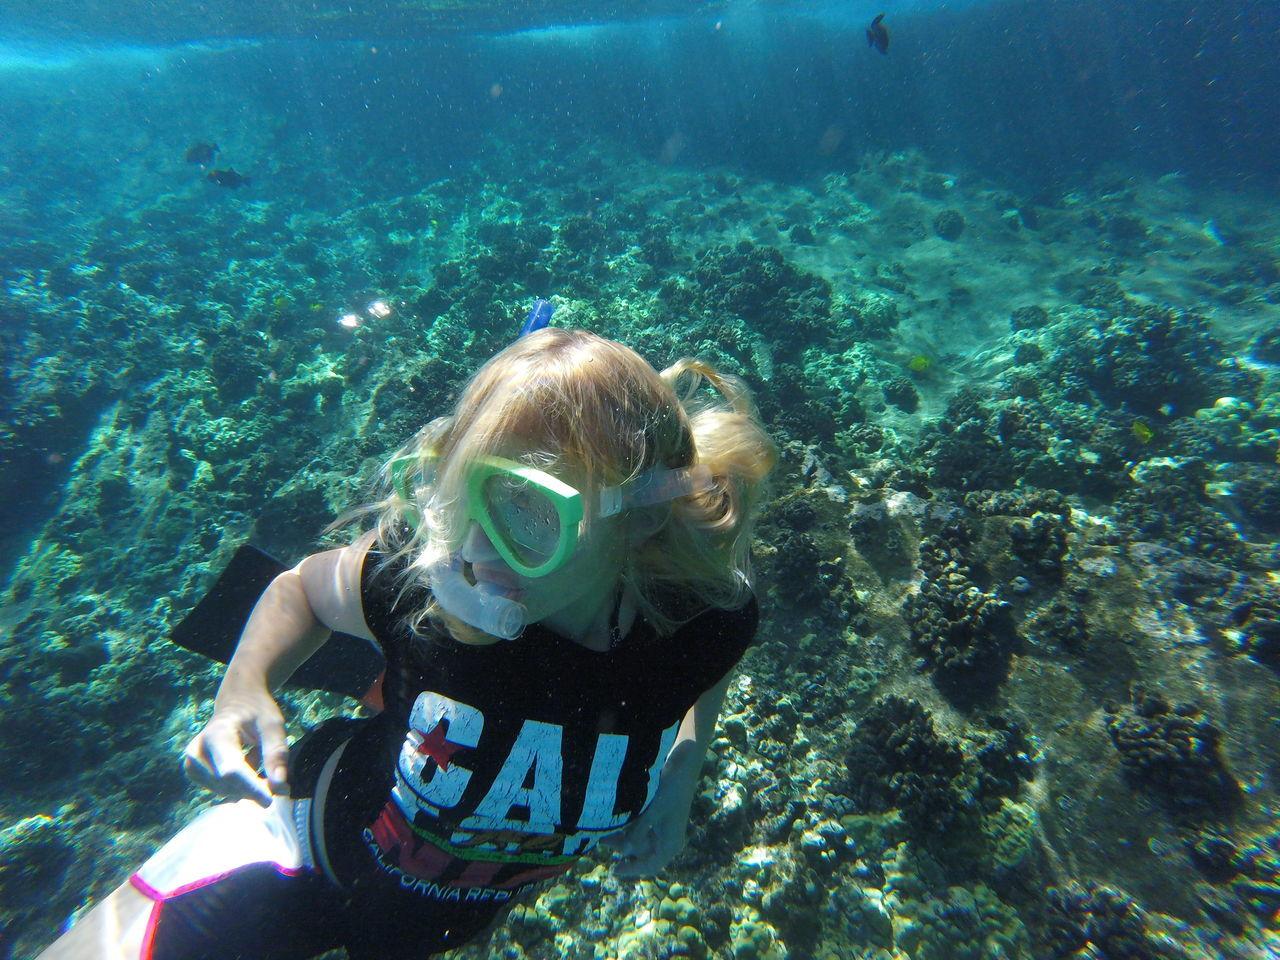 Gopro Goprohero4 Hawaii Maui Maui Hawaii Mauiphotography Molokini Ocean Photography Ocean View Oceanside Snorkel Snorkeling Snorkeling Photo Travel Destination Travel Destinations Underwater Underwaterphotography Women Women Around The World